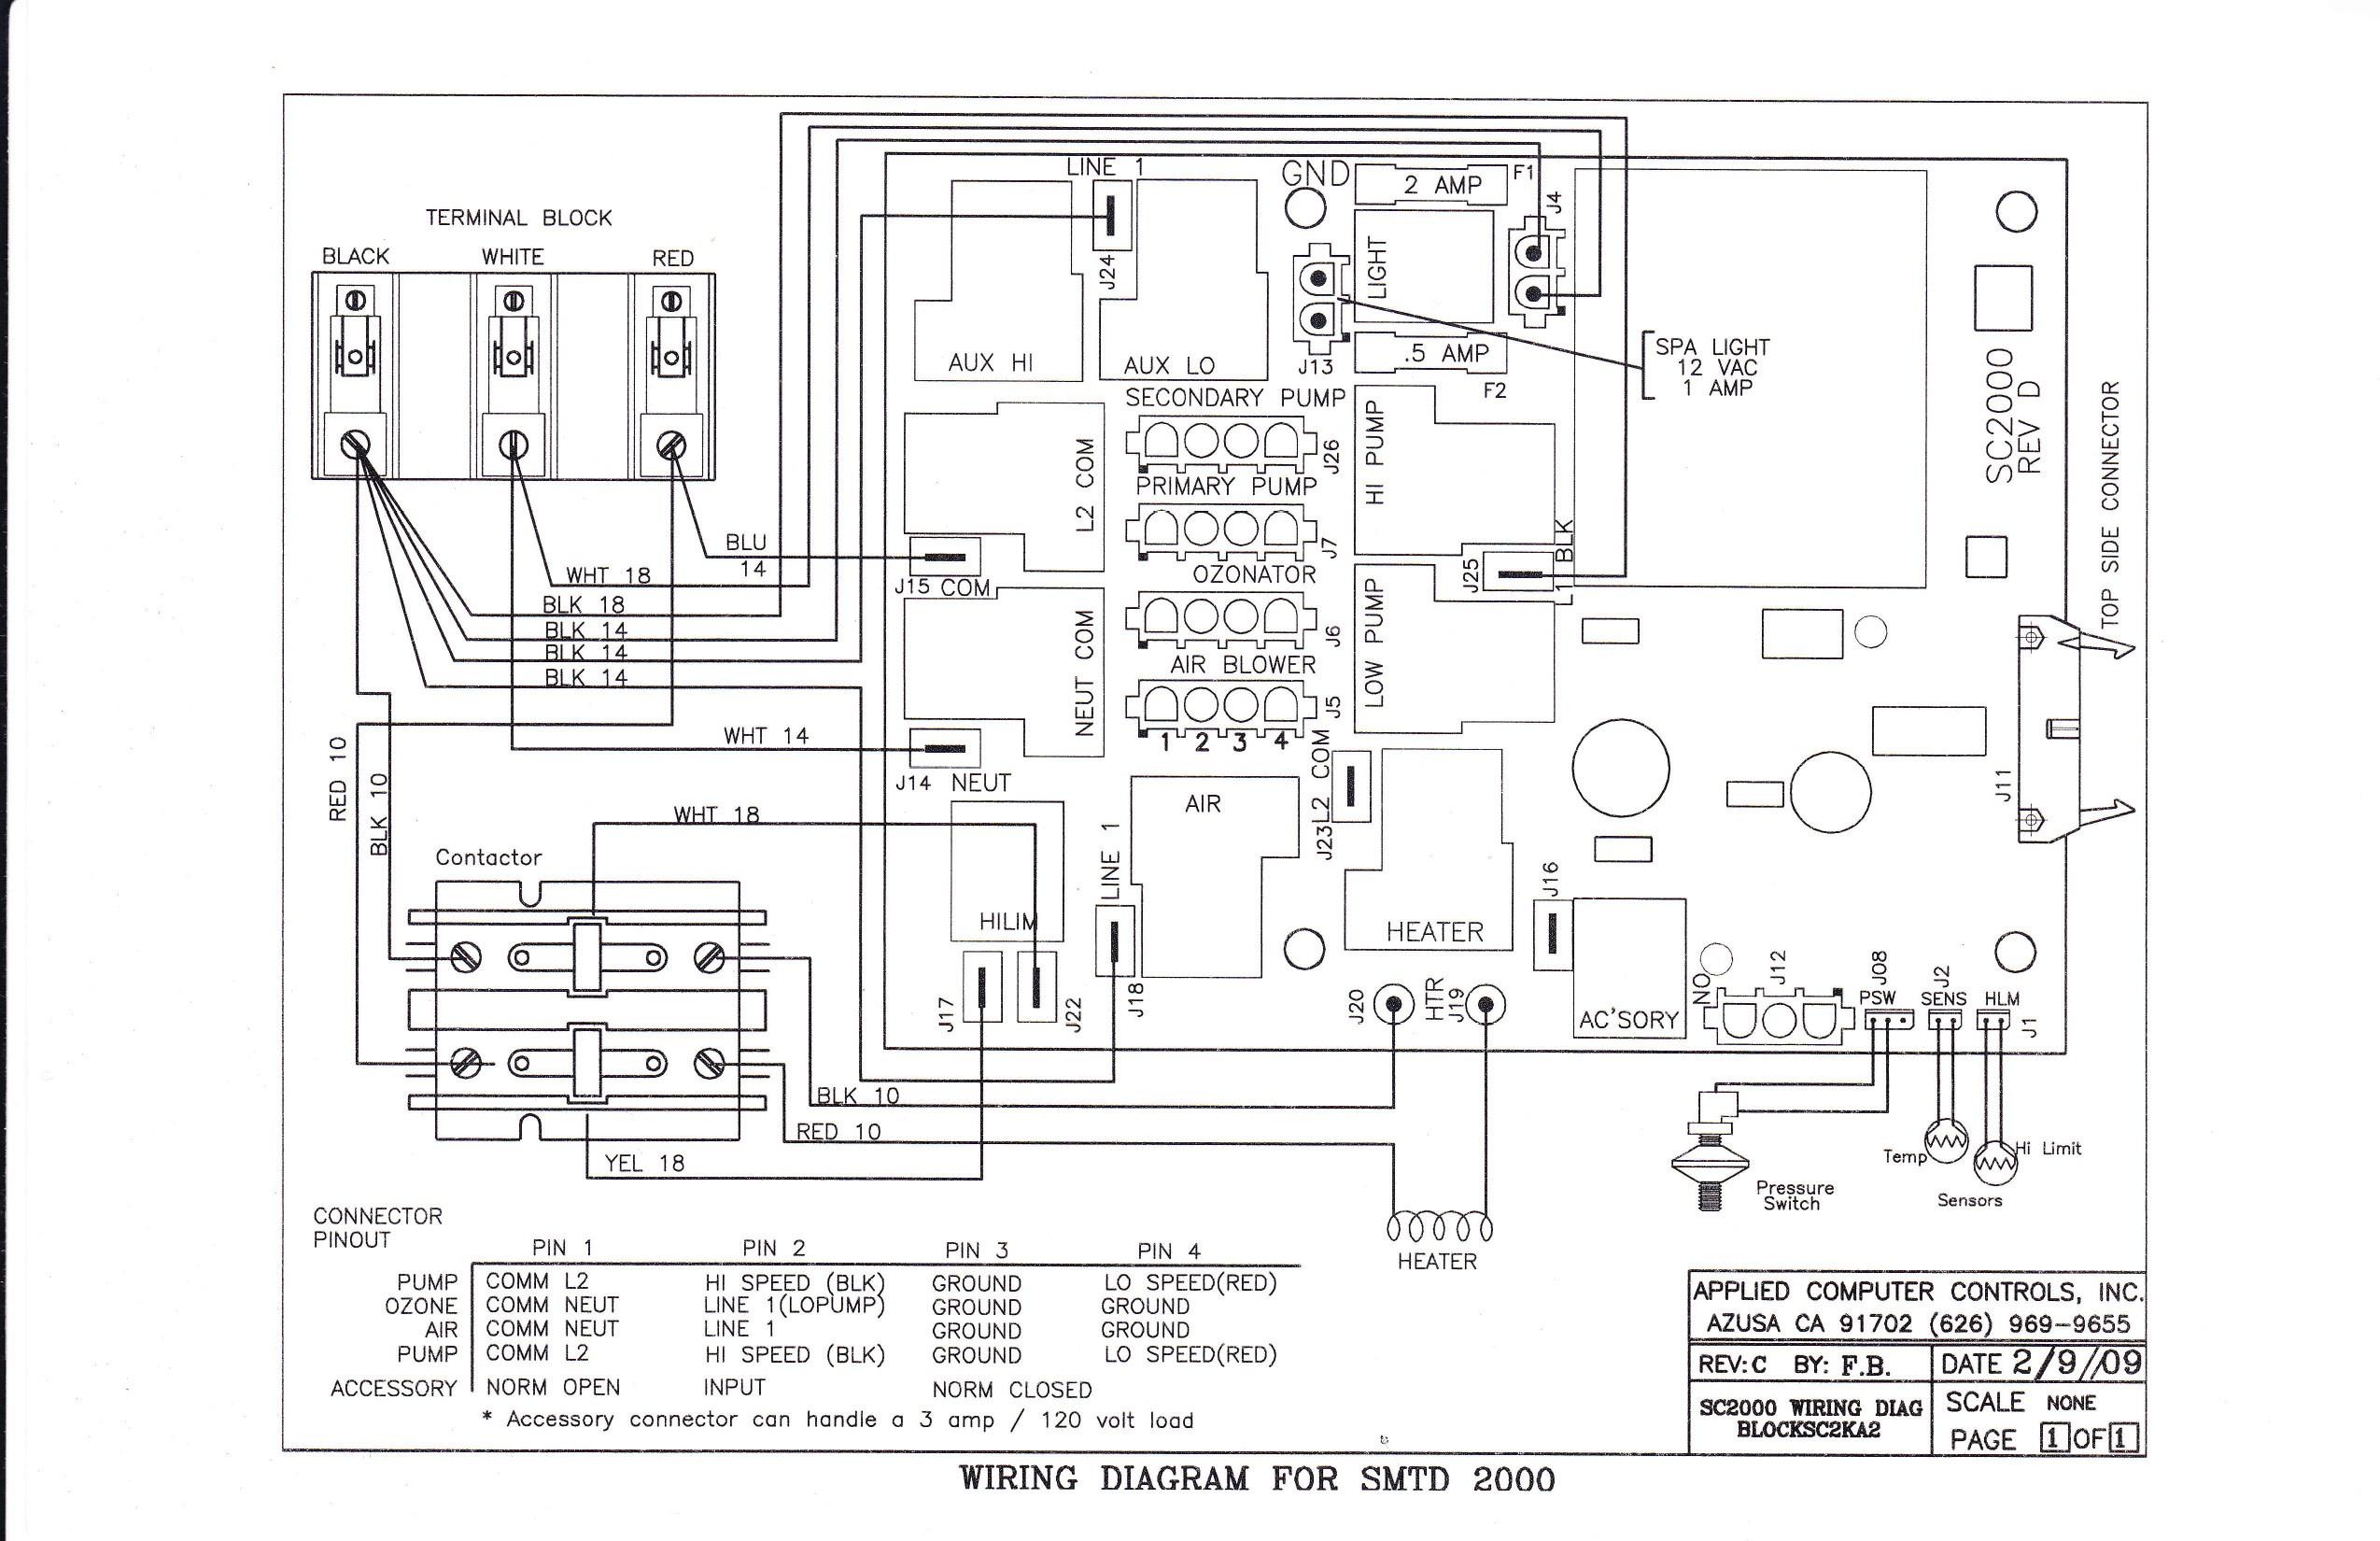 [SCHEMATICS_48DE]  Thomas Buses Wiring Diagrams 1995 Honda Seat Wiring -  podewiring.durian.astrea-construction.fr | 2007 Thomas C2 Brake Wiring Diagram |  | ASTREA CONSTRUCTION